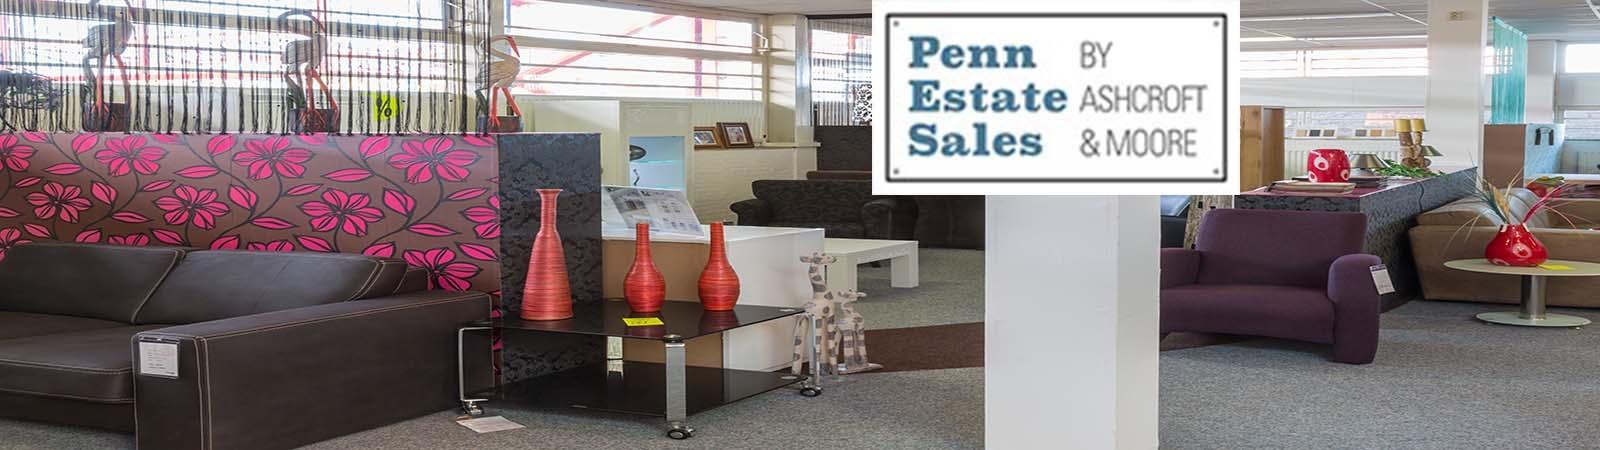 Ashcroft And Moore LLC | Auction Ninja